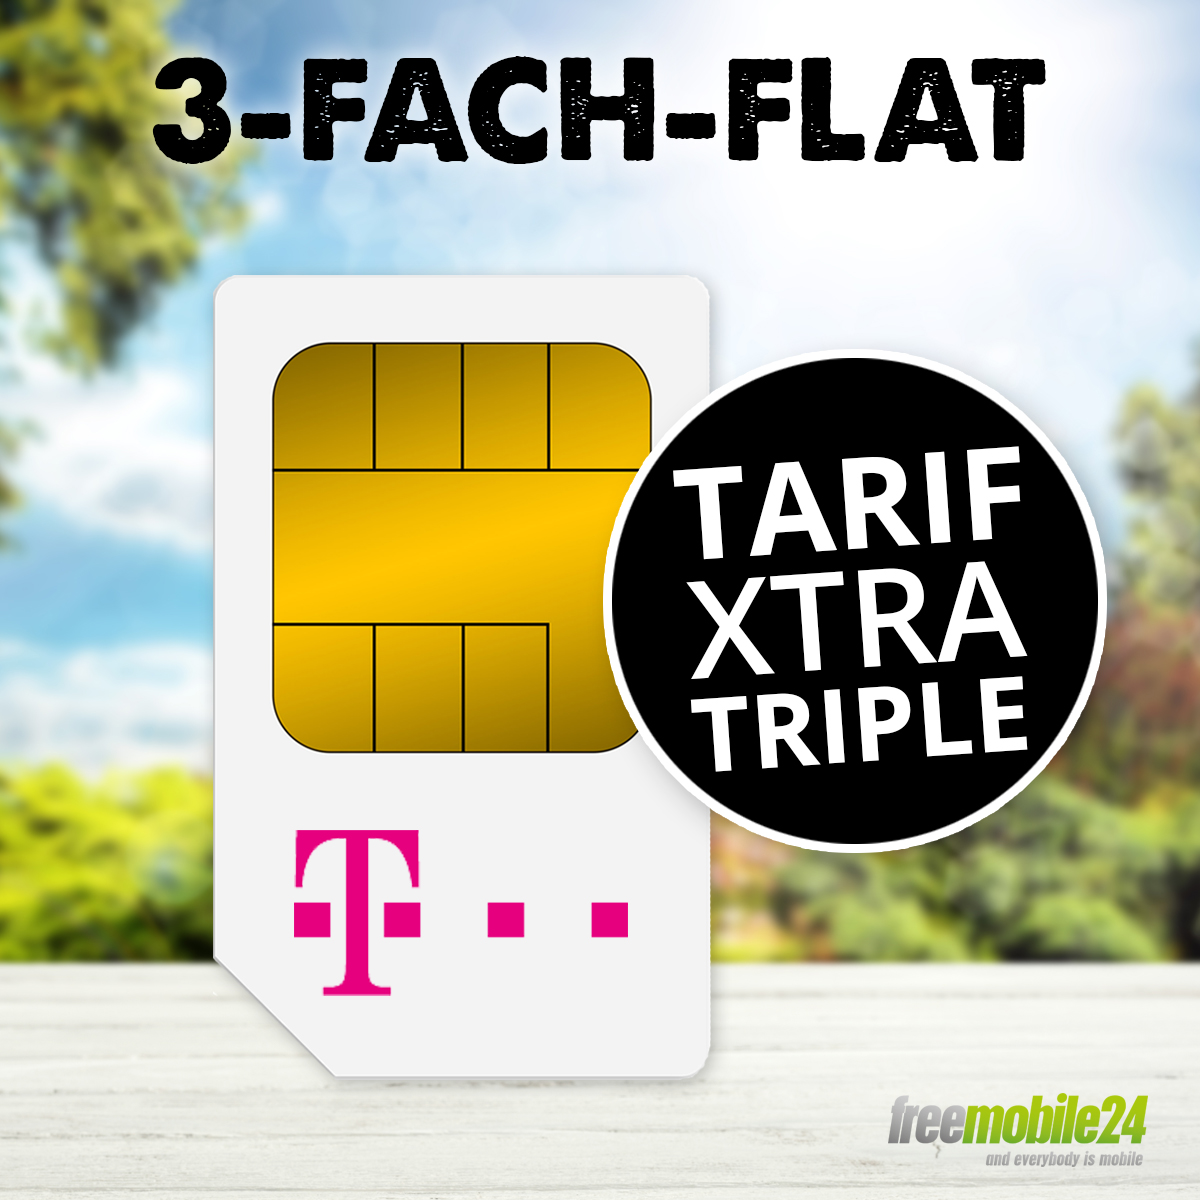 xtra triple prepaid 10 startguthaben sim karte telekom internet sms flat neu ebay. Black Bedroom Furniture Sets. Home Design Ideas